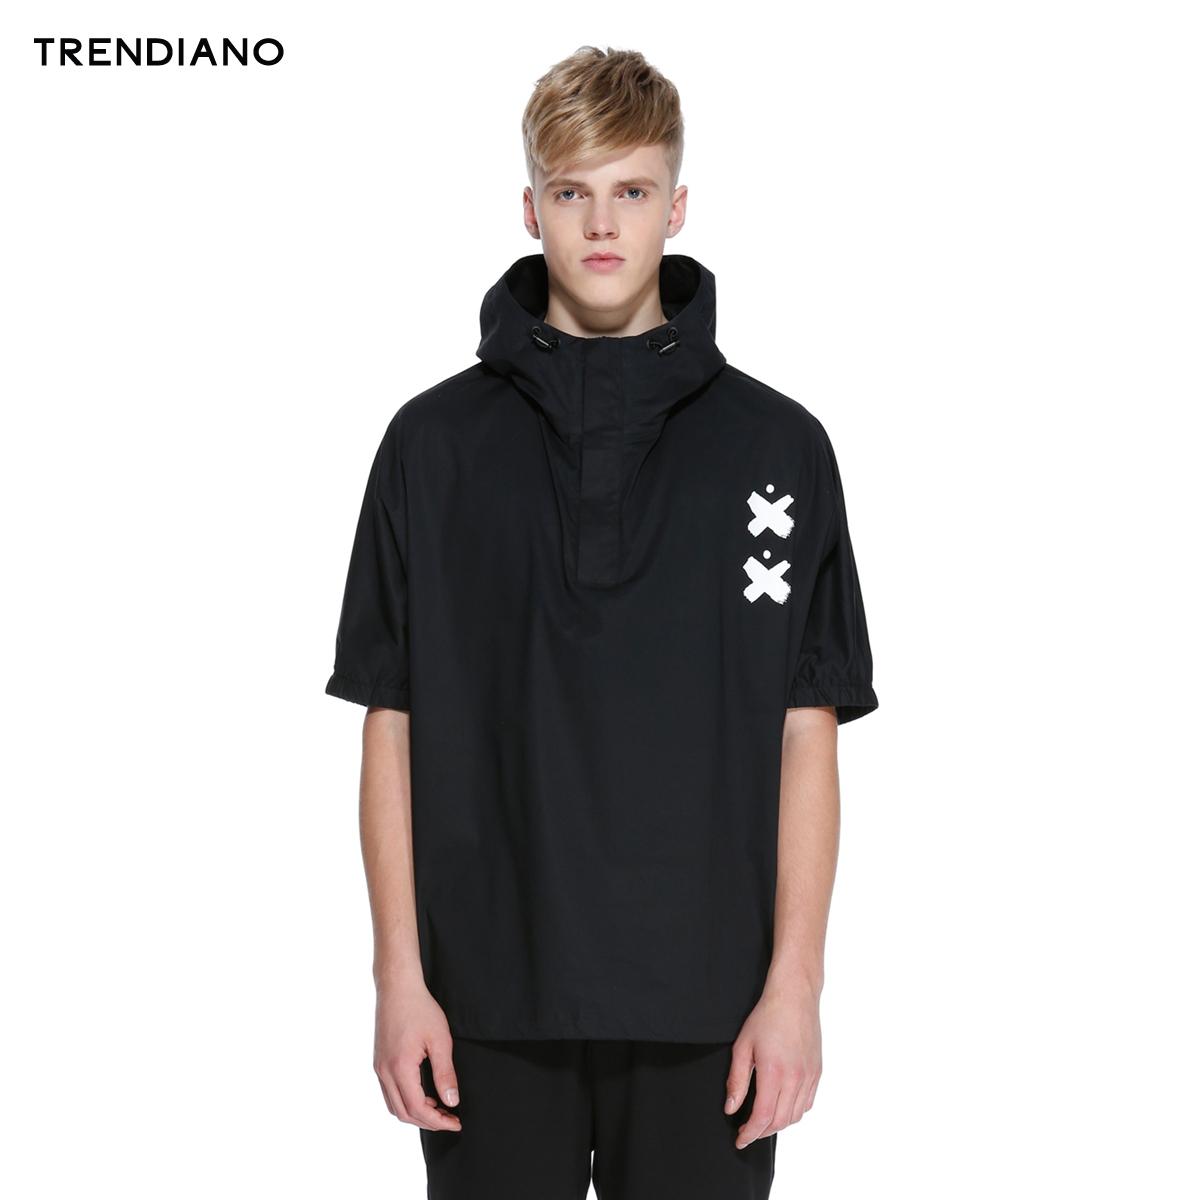 TRENDIANO新2016男裝夏裝潮棉質寬鬆套頭連帽短袖襯衫3HC2015180